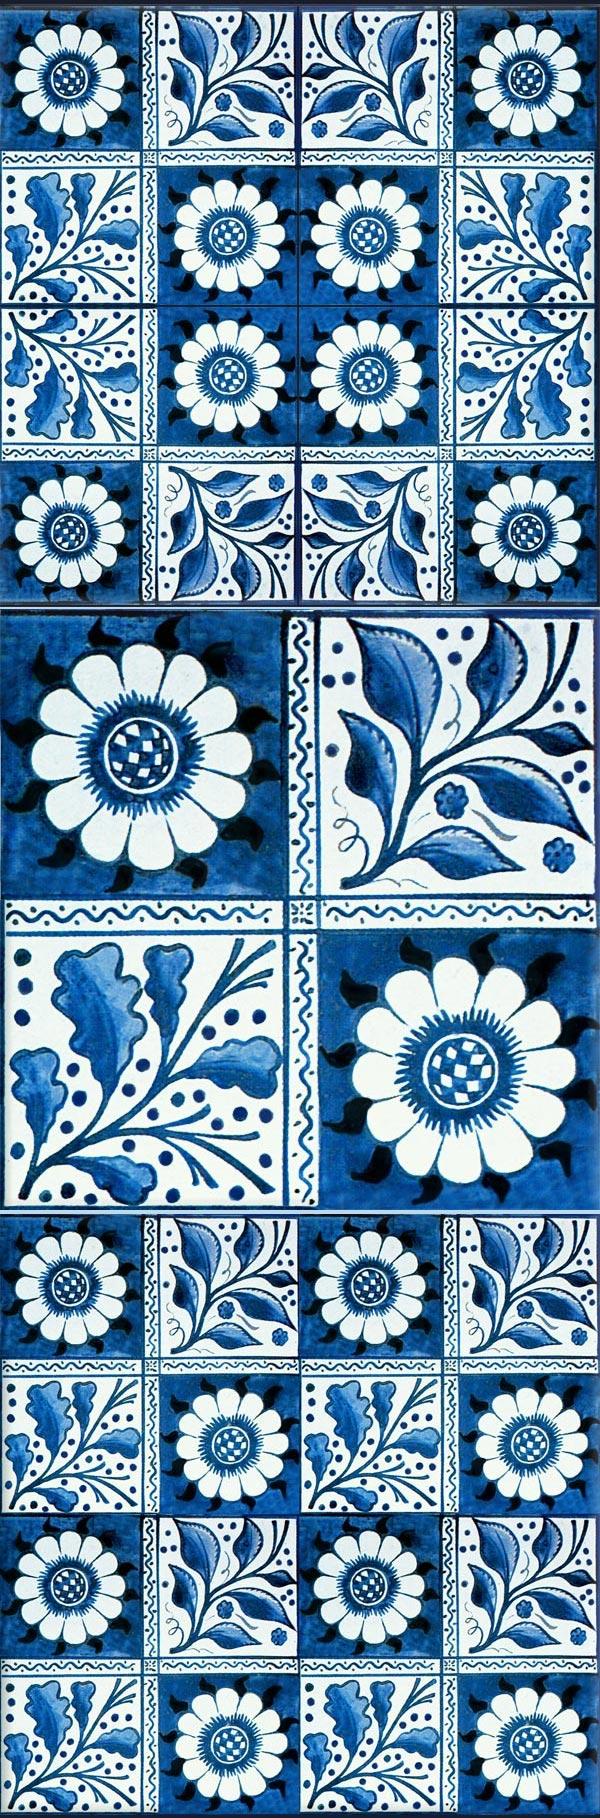 William Morris and Philip Webb Longden tiles, 1870s.